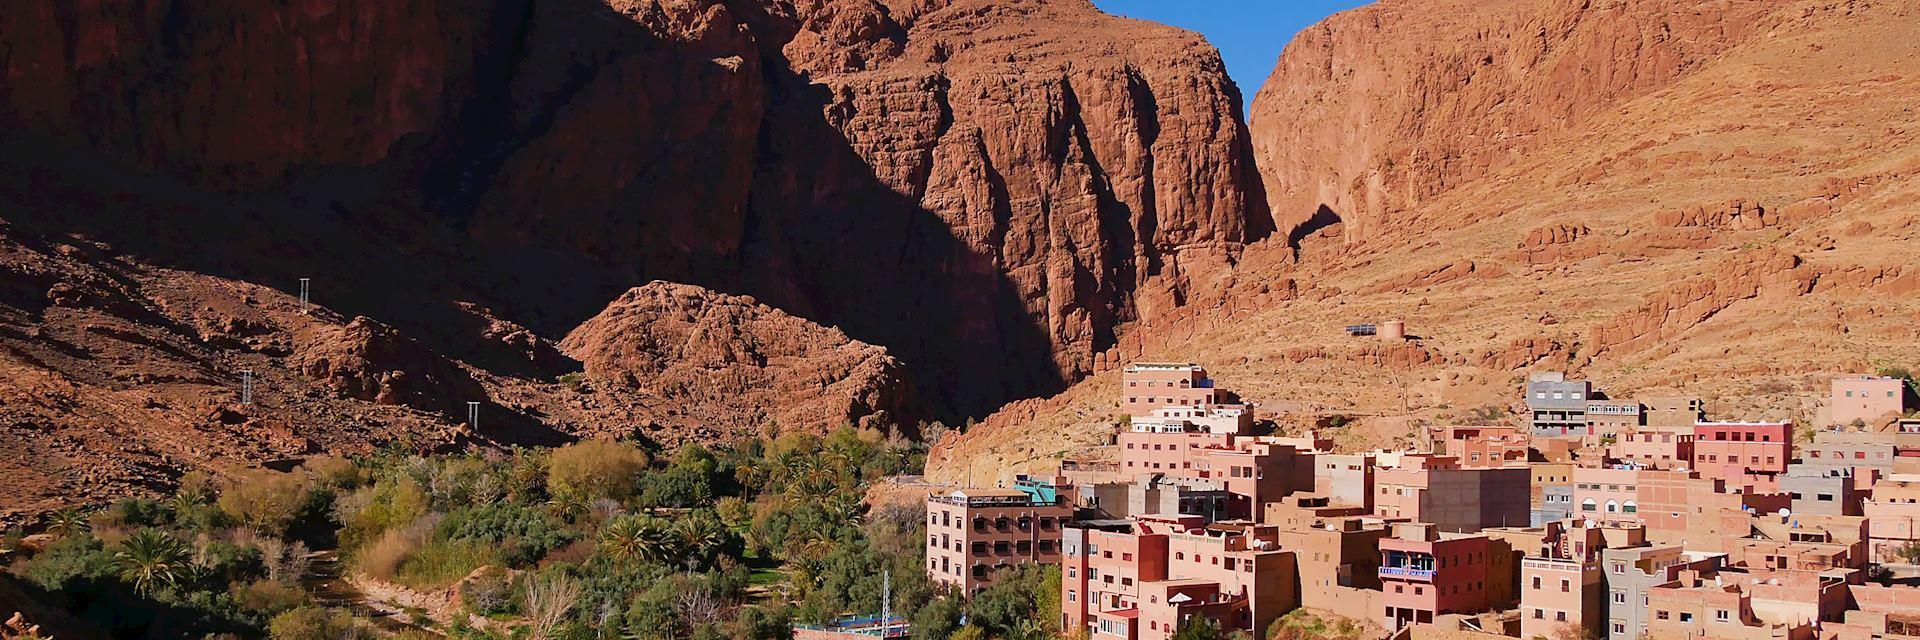 Berber village near Tinghir